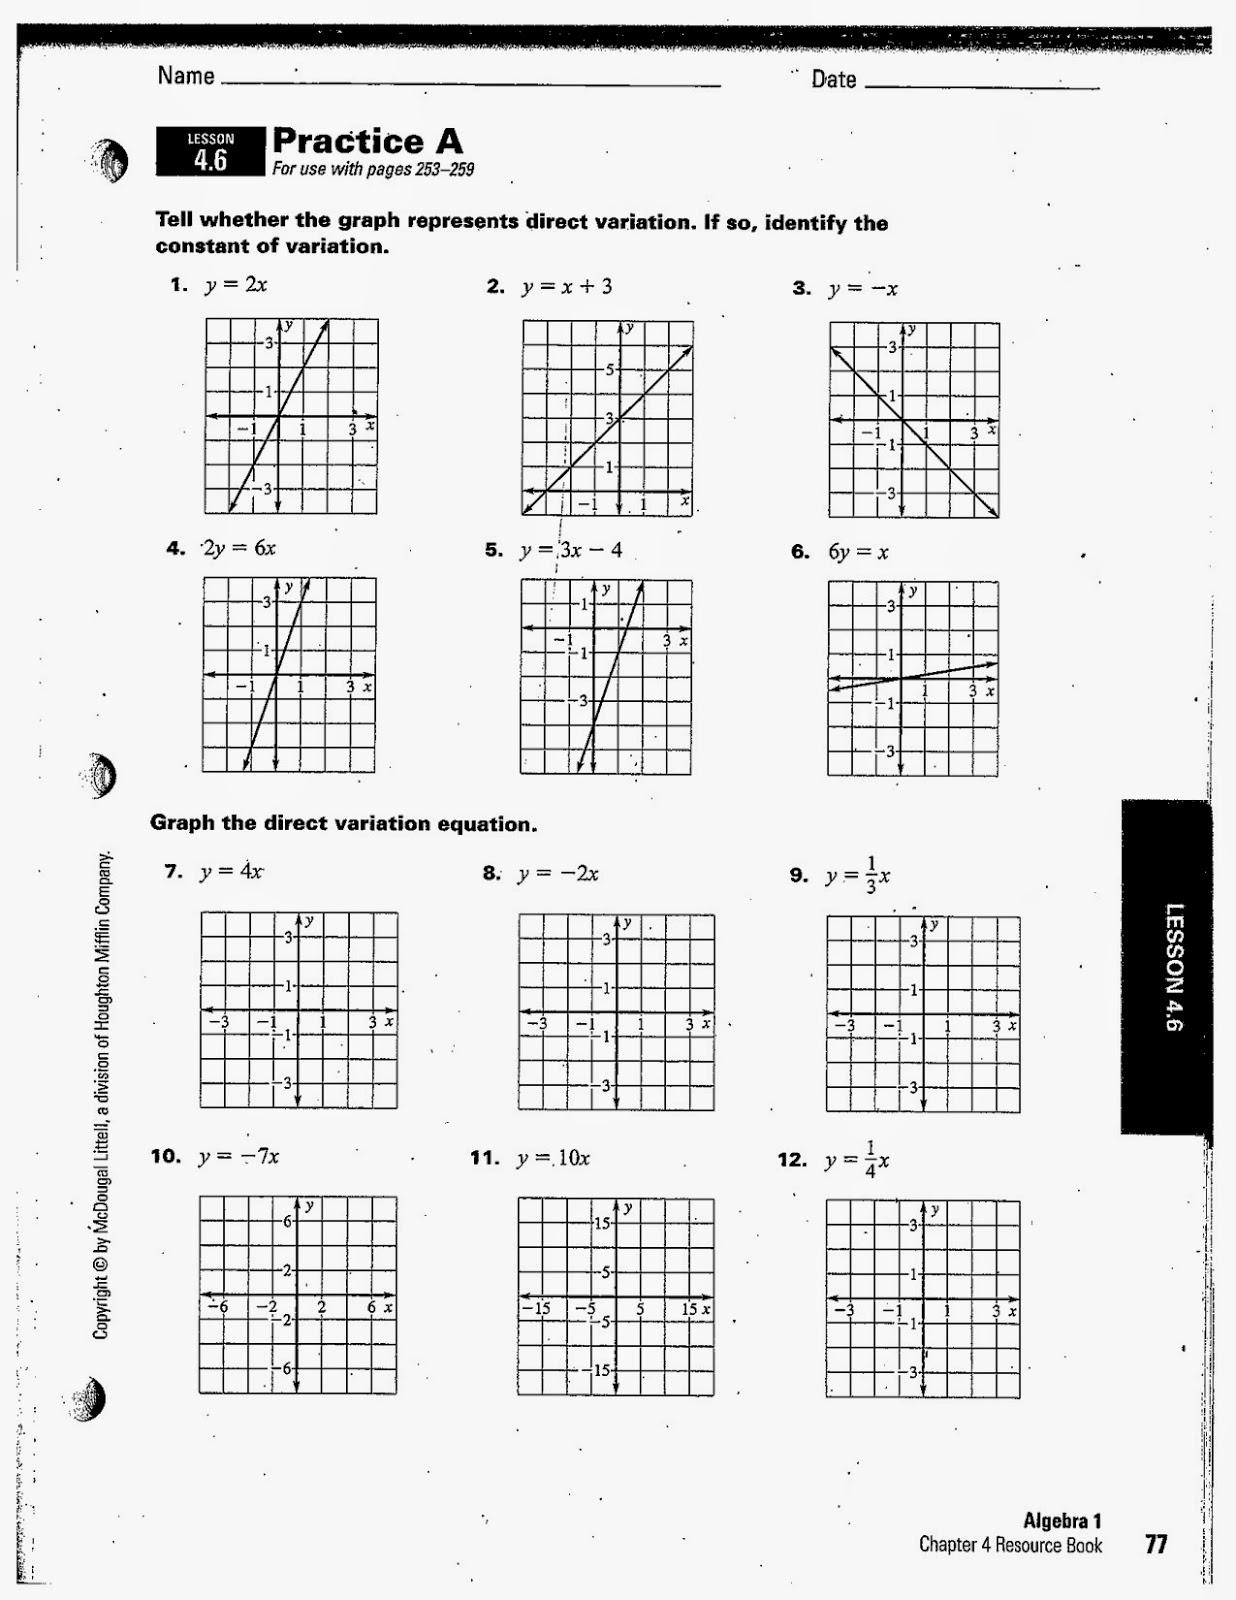 Heidemann 8th Grade Math October 2014 – Direct Variation Worksheets